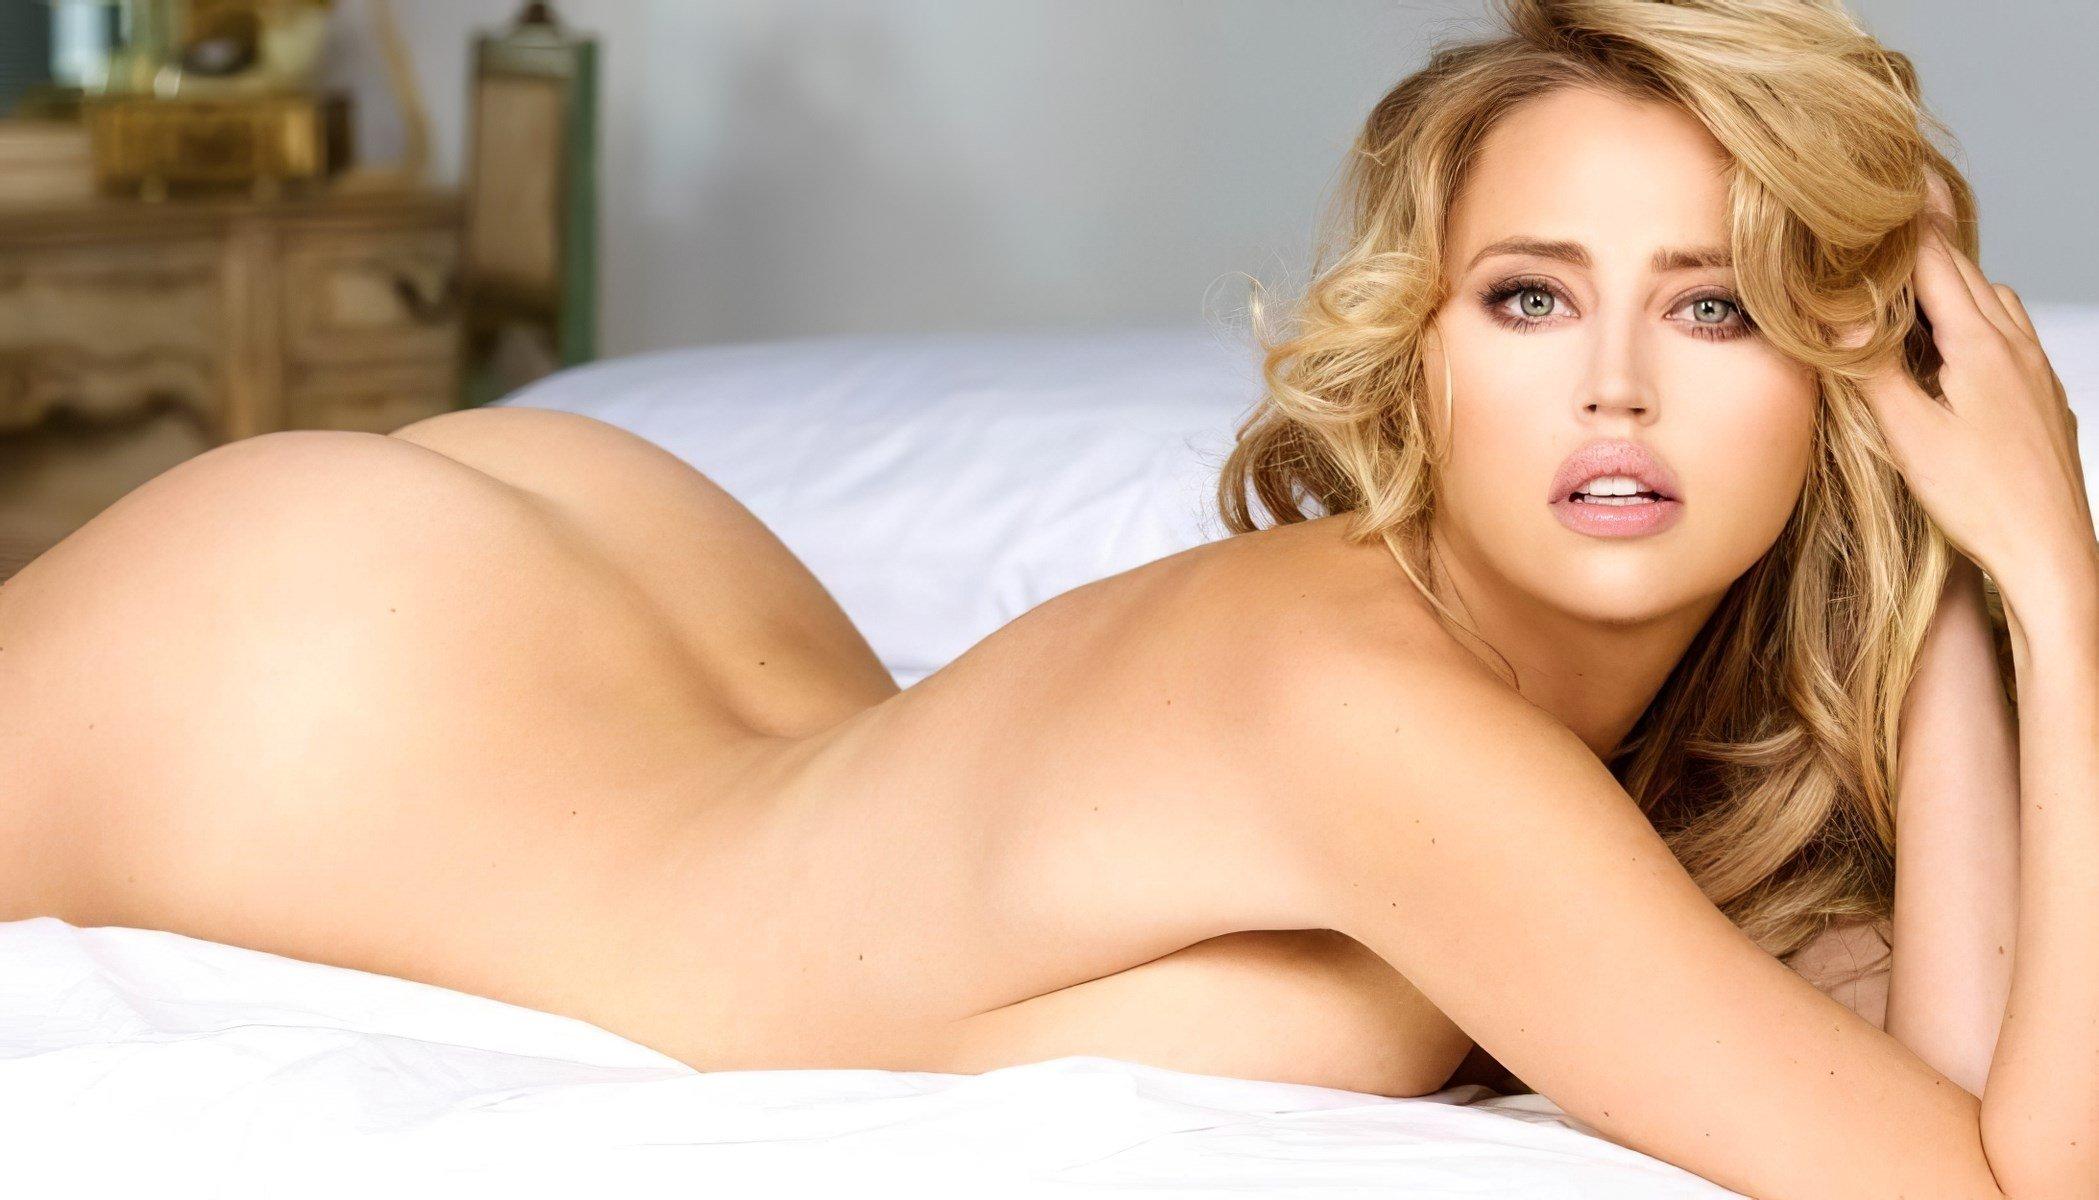 Emmanuelle vaugier nude photos